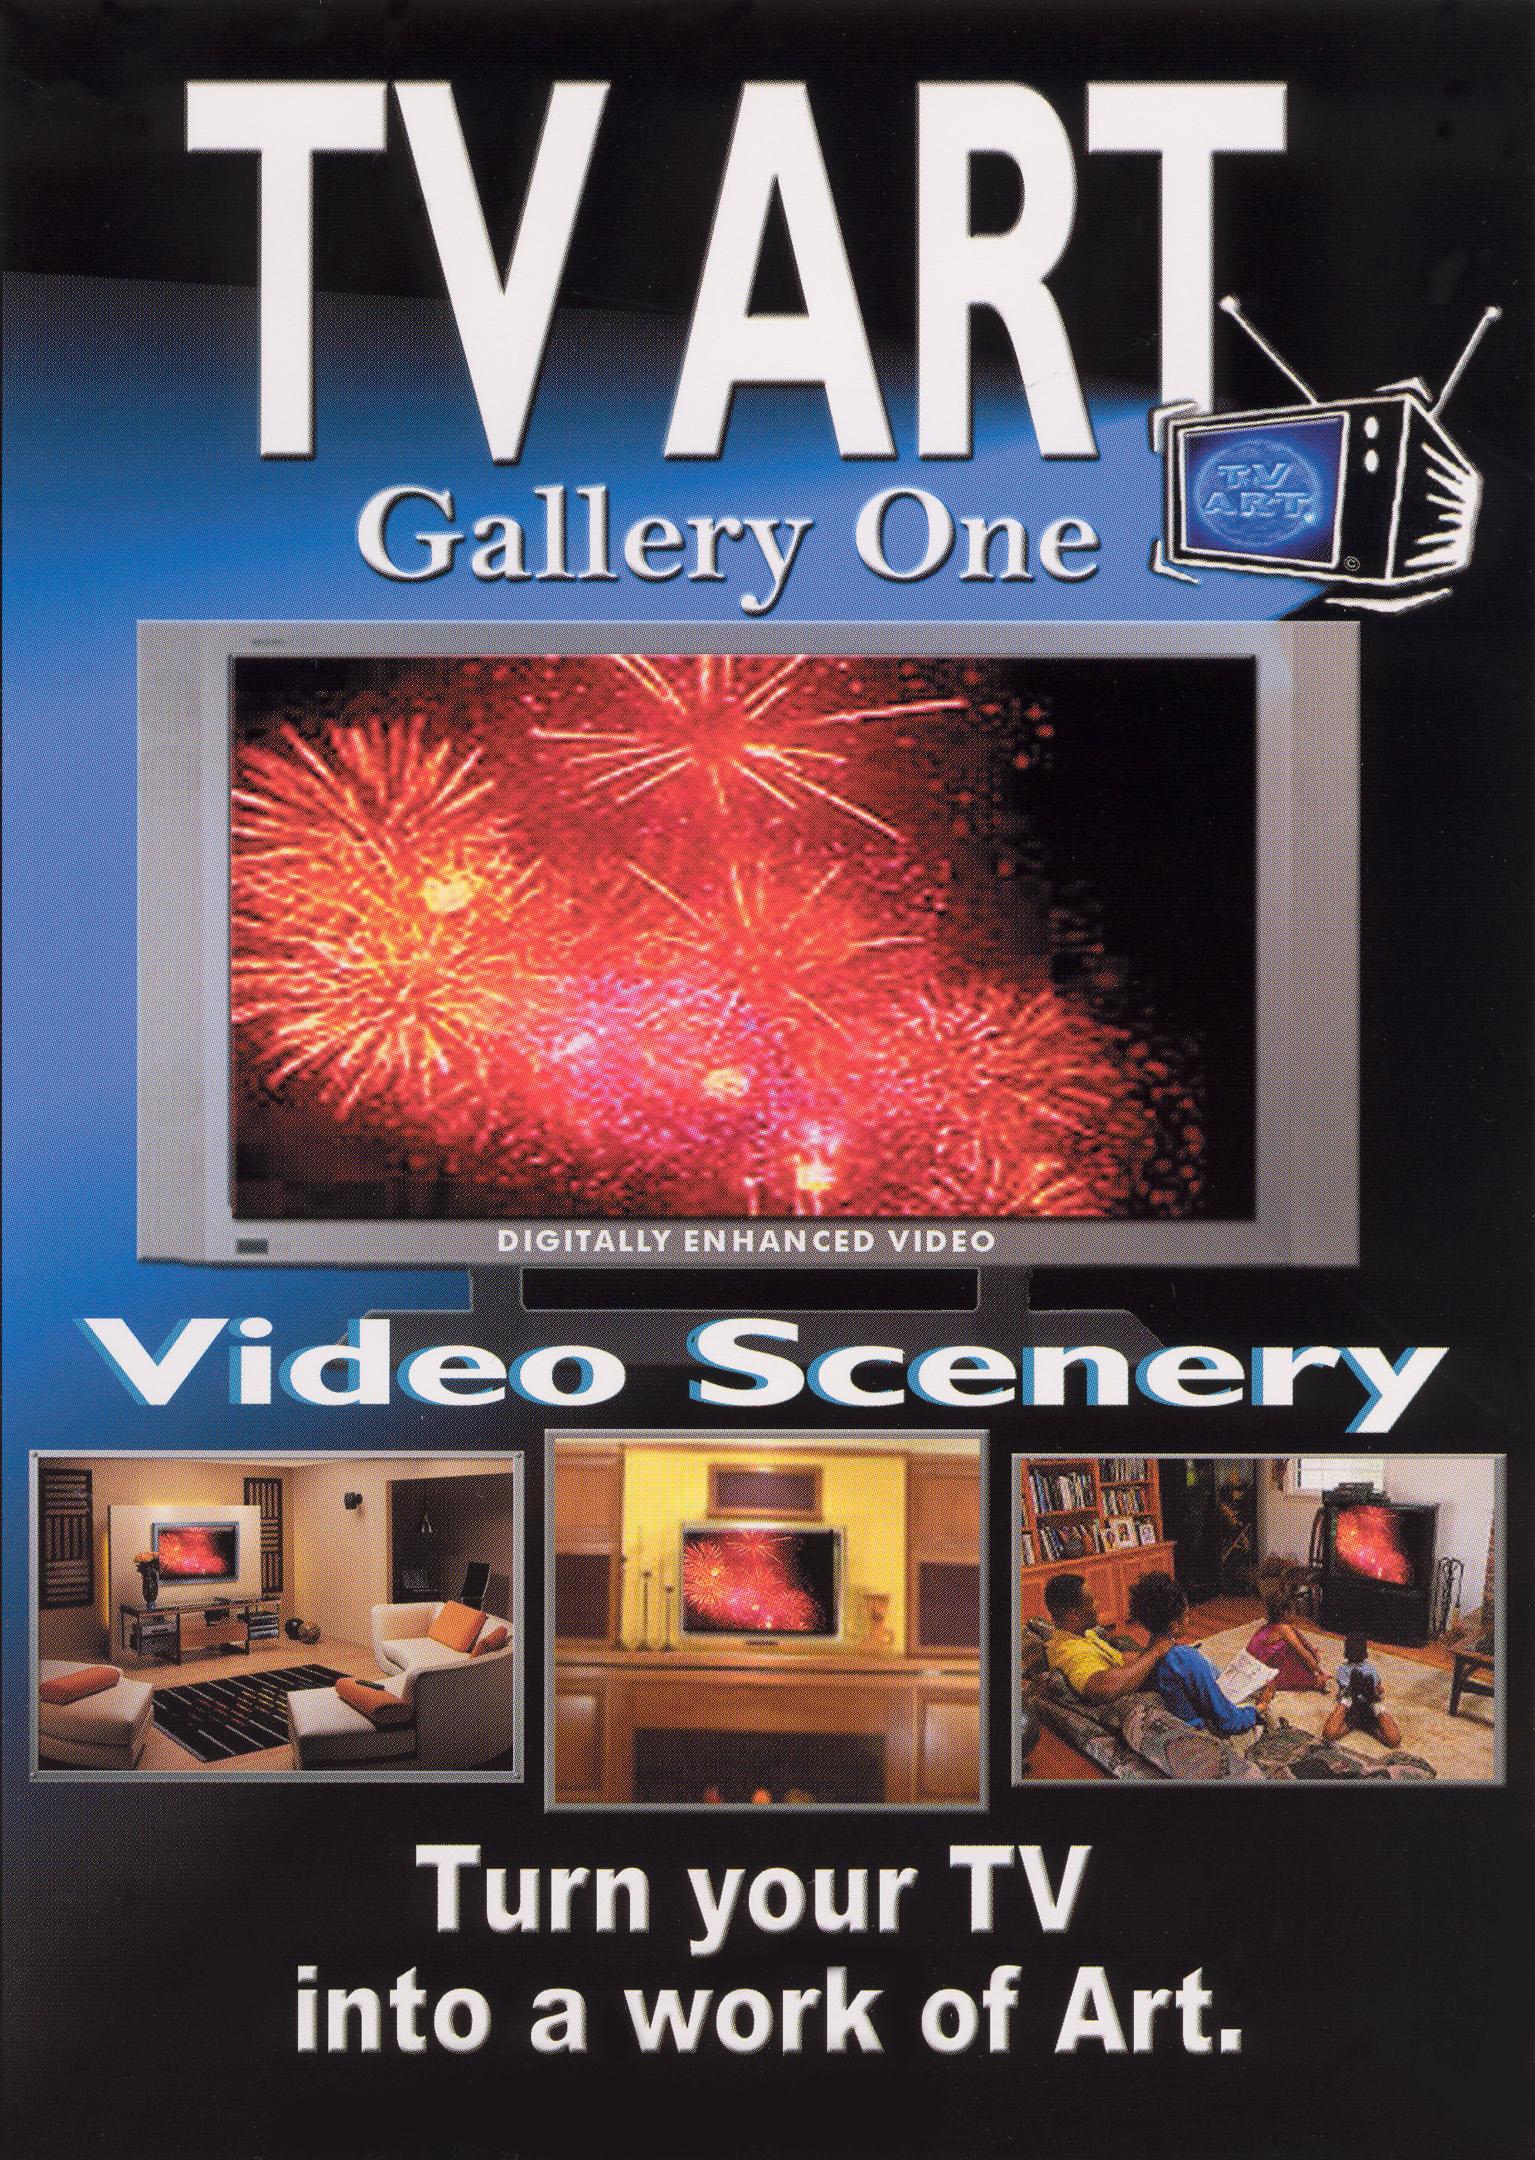 TV Art Video Scenery Gallery, Vol. 1